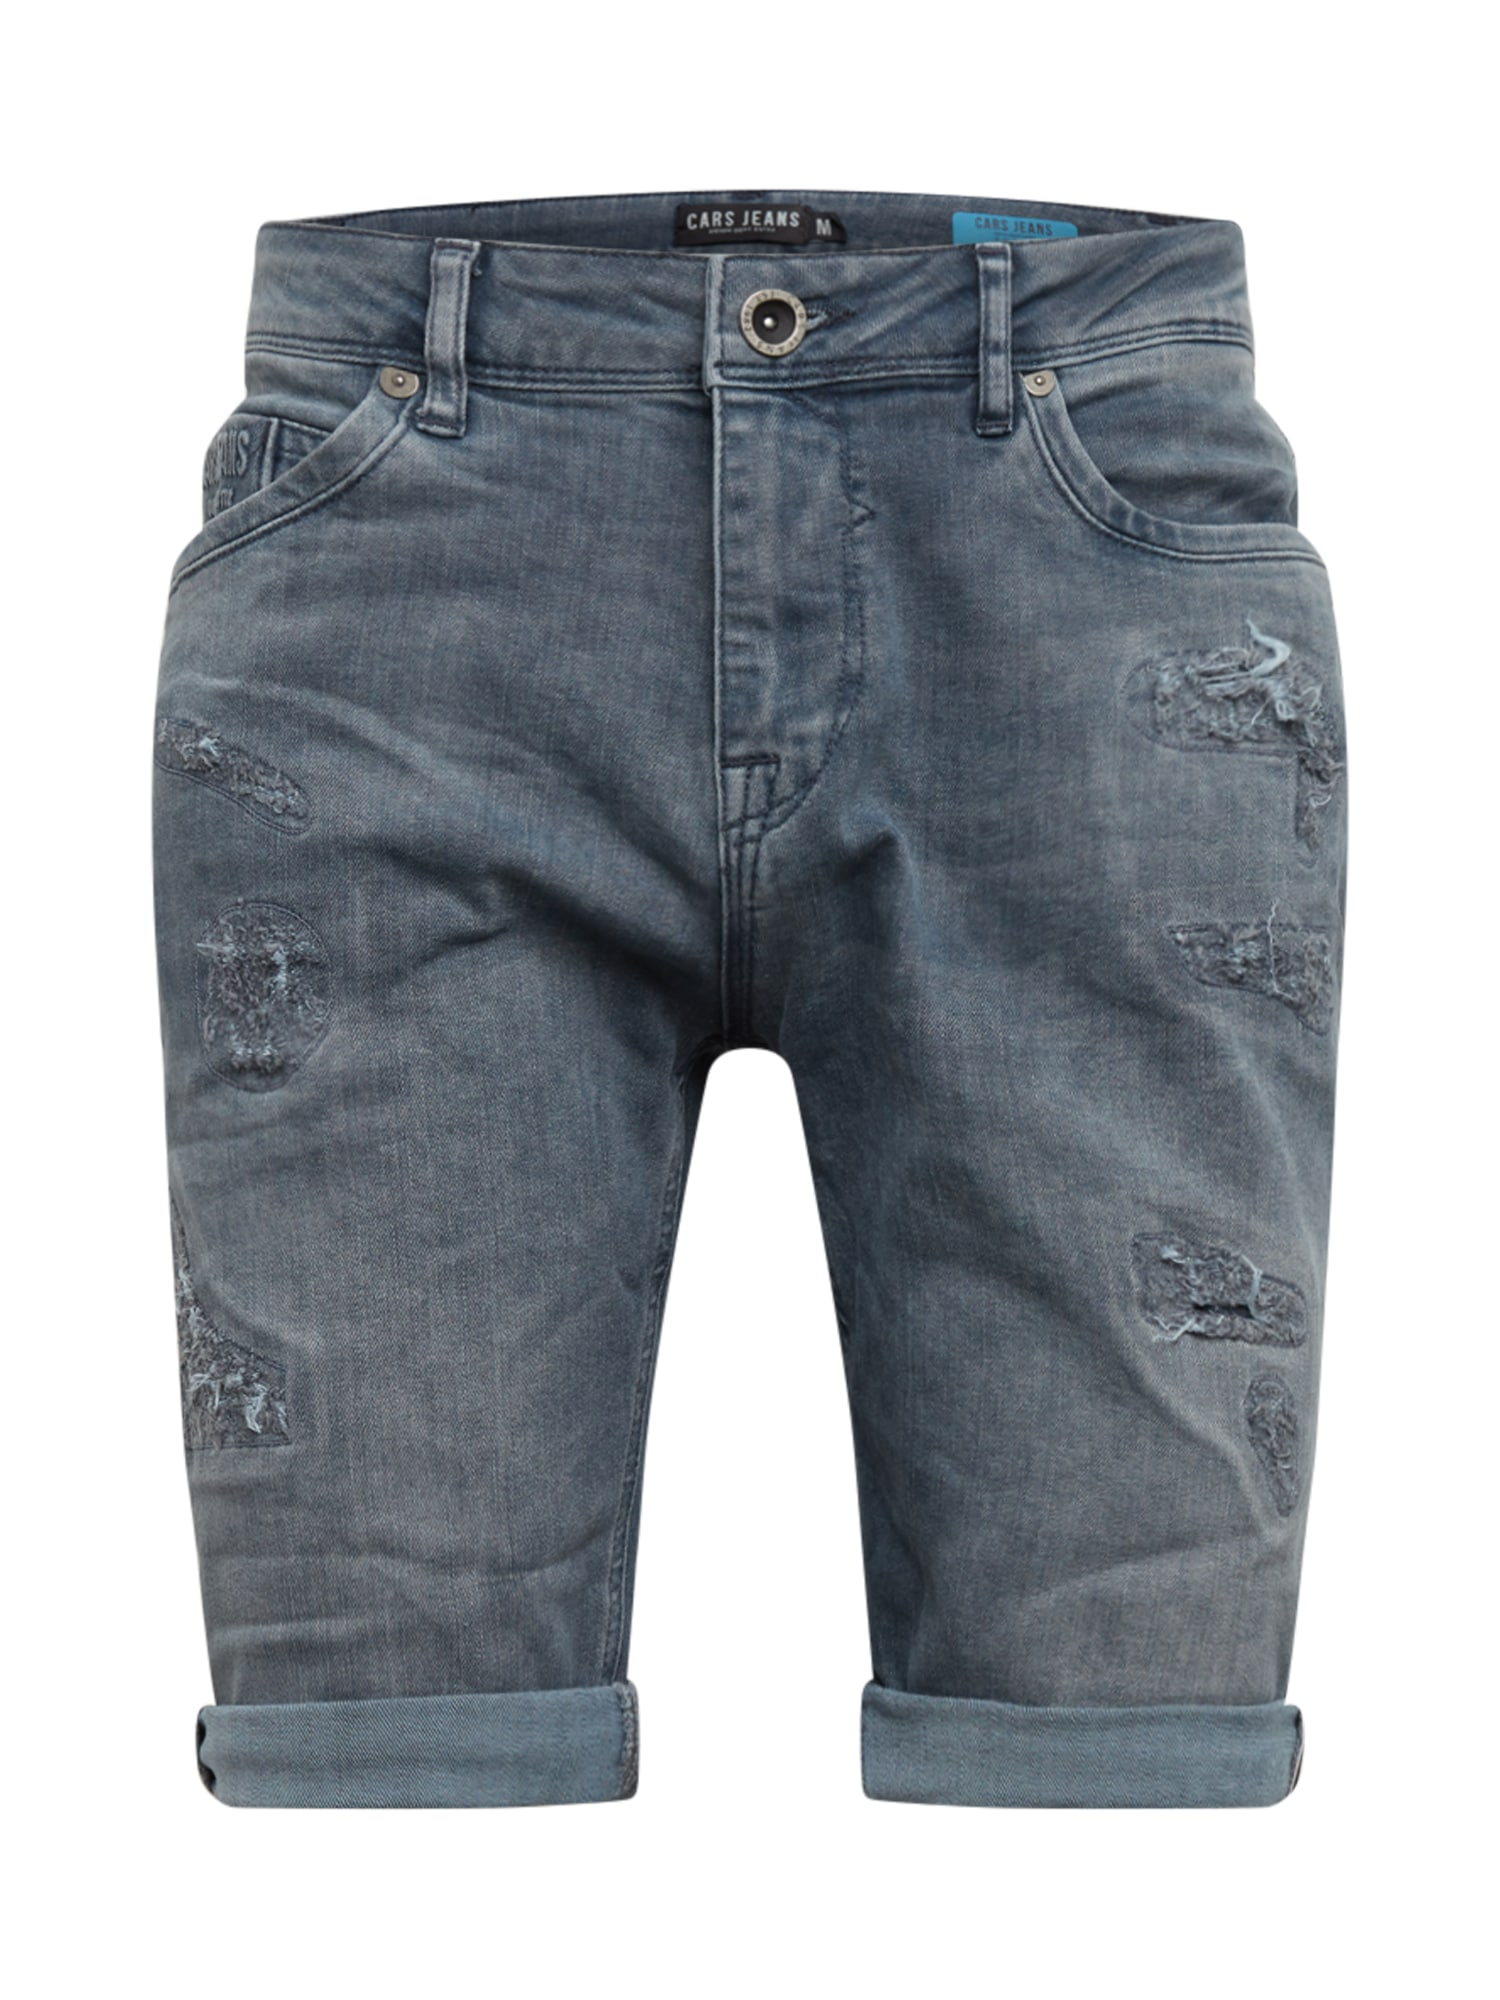 Cars Jeans Džinsai 'BECKER' pilko džinso